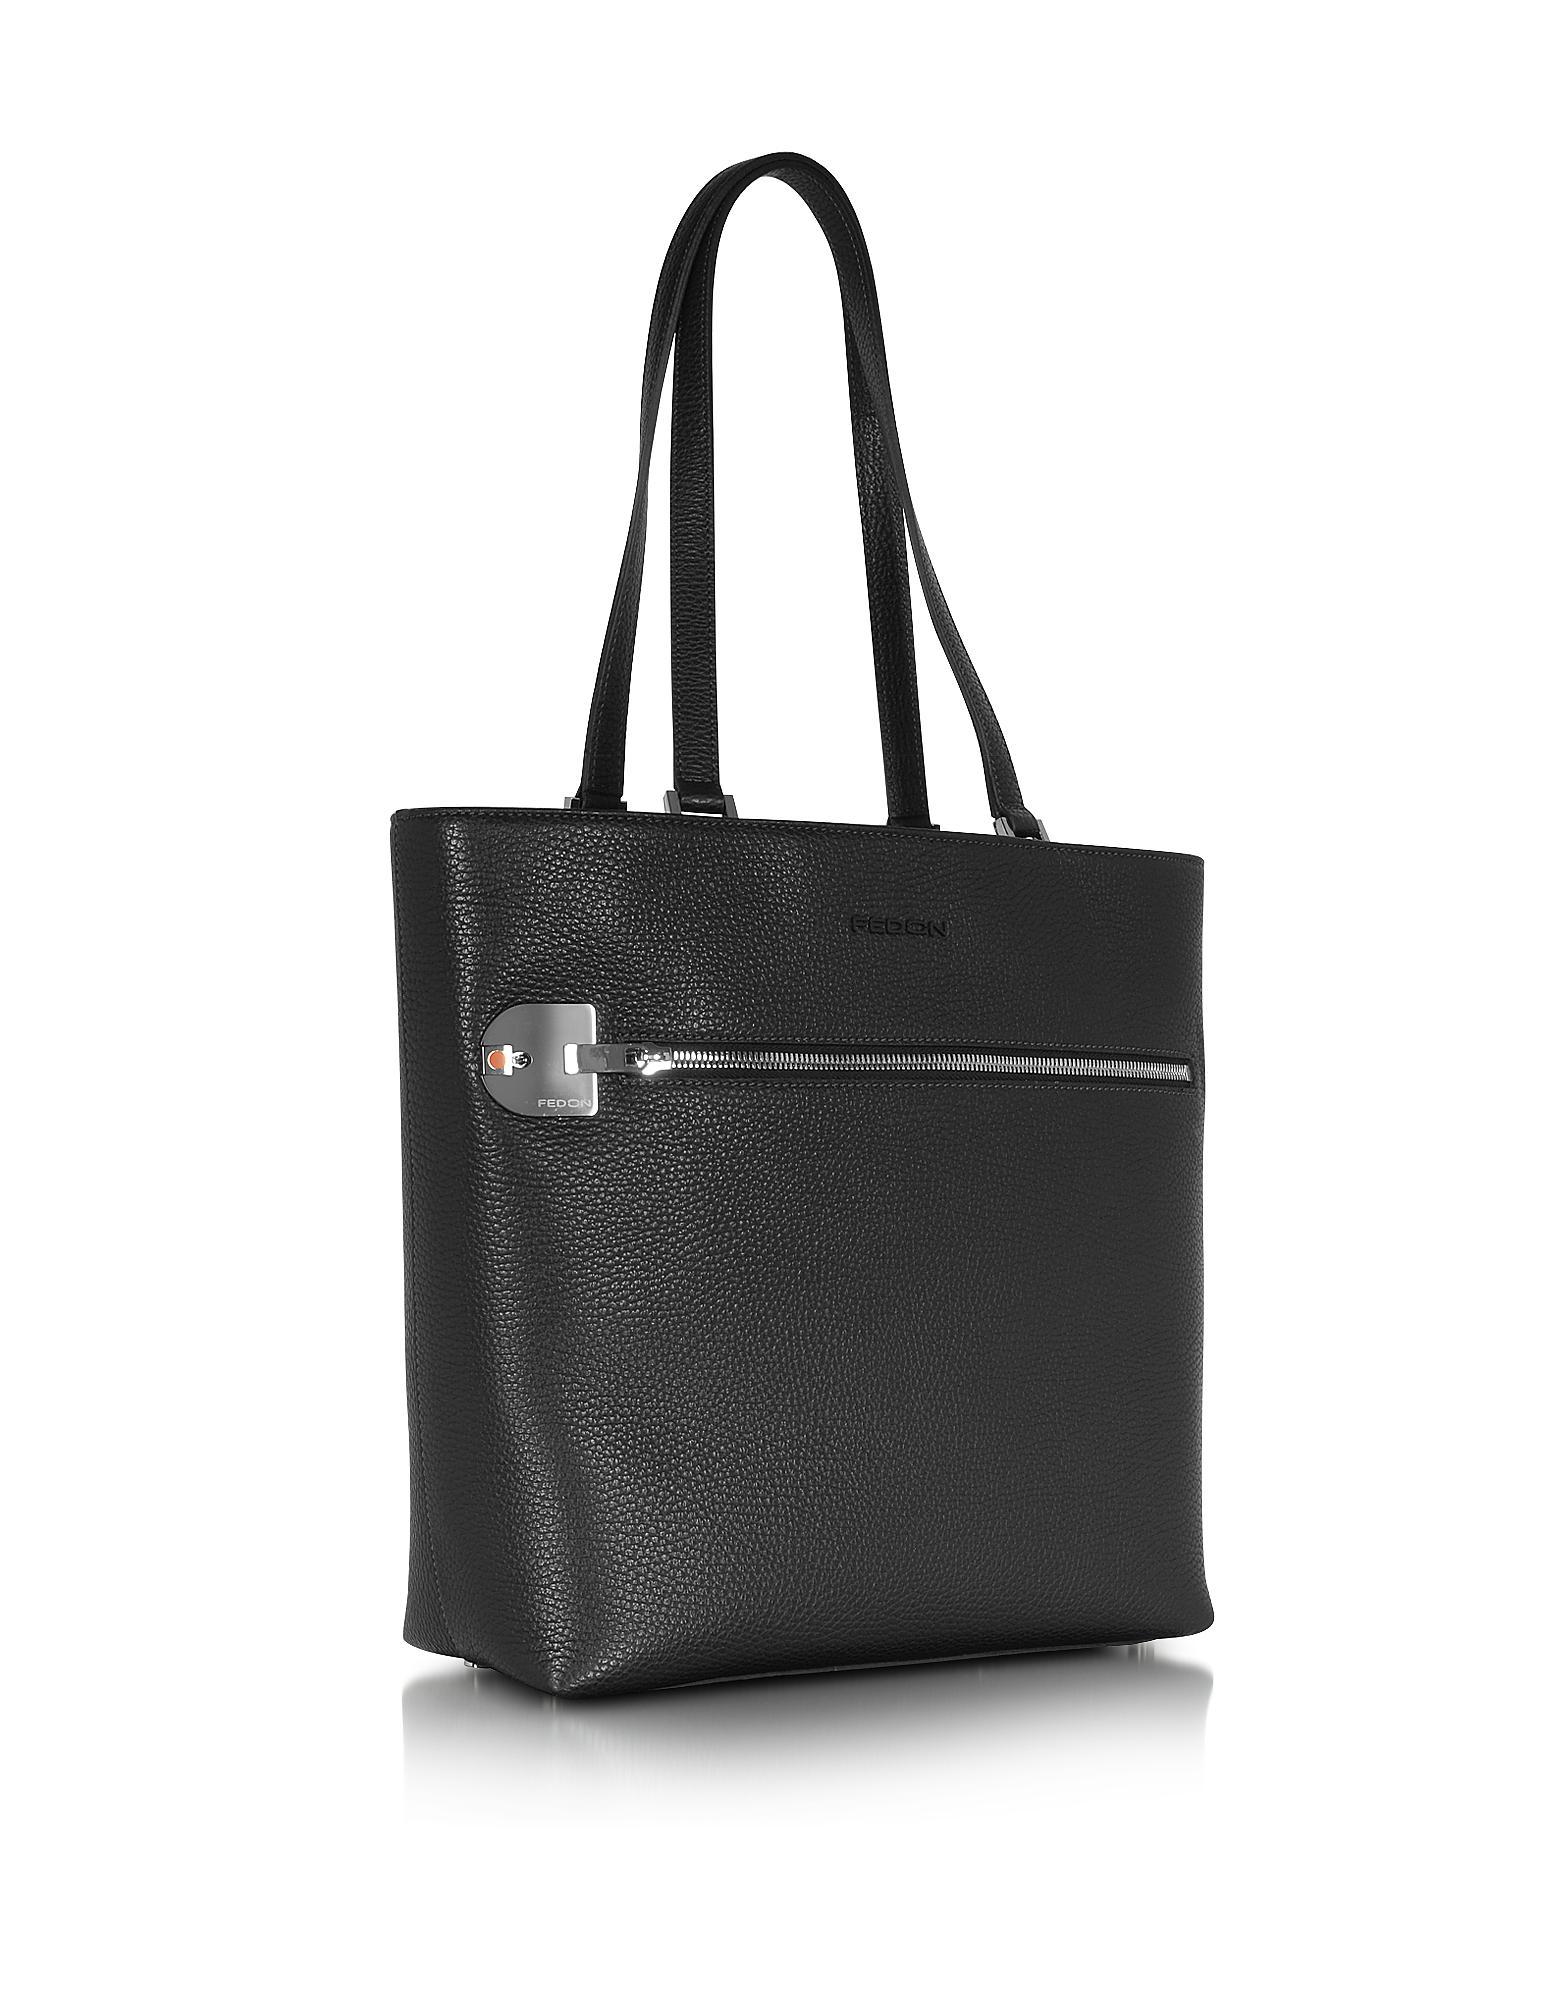 Giorgio fedon Amelia Black Leather Tote Bag in Black